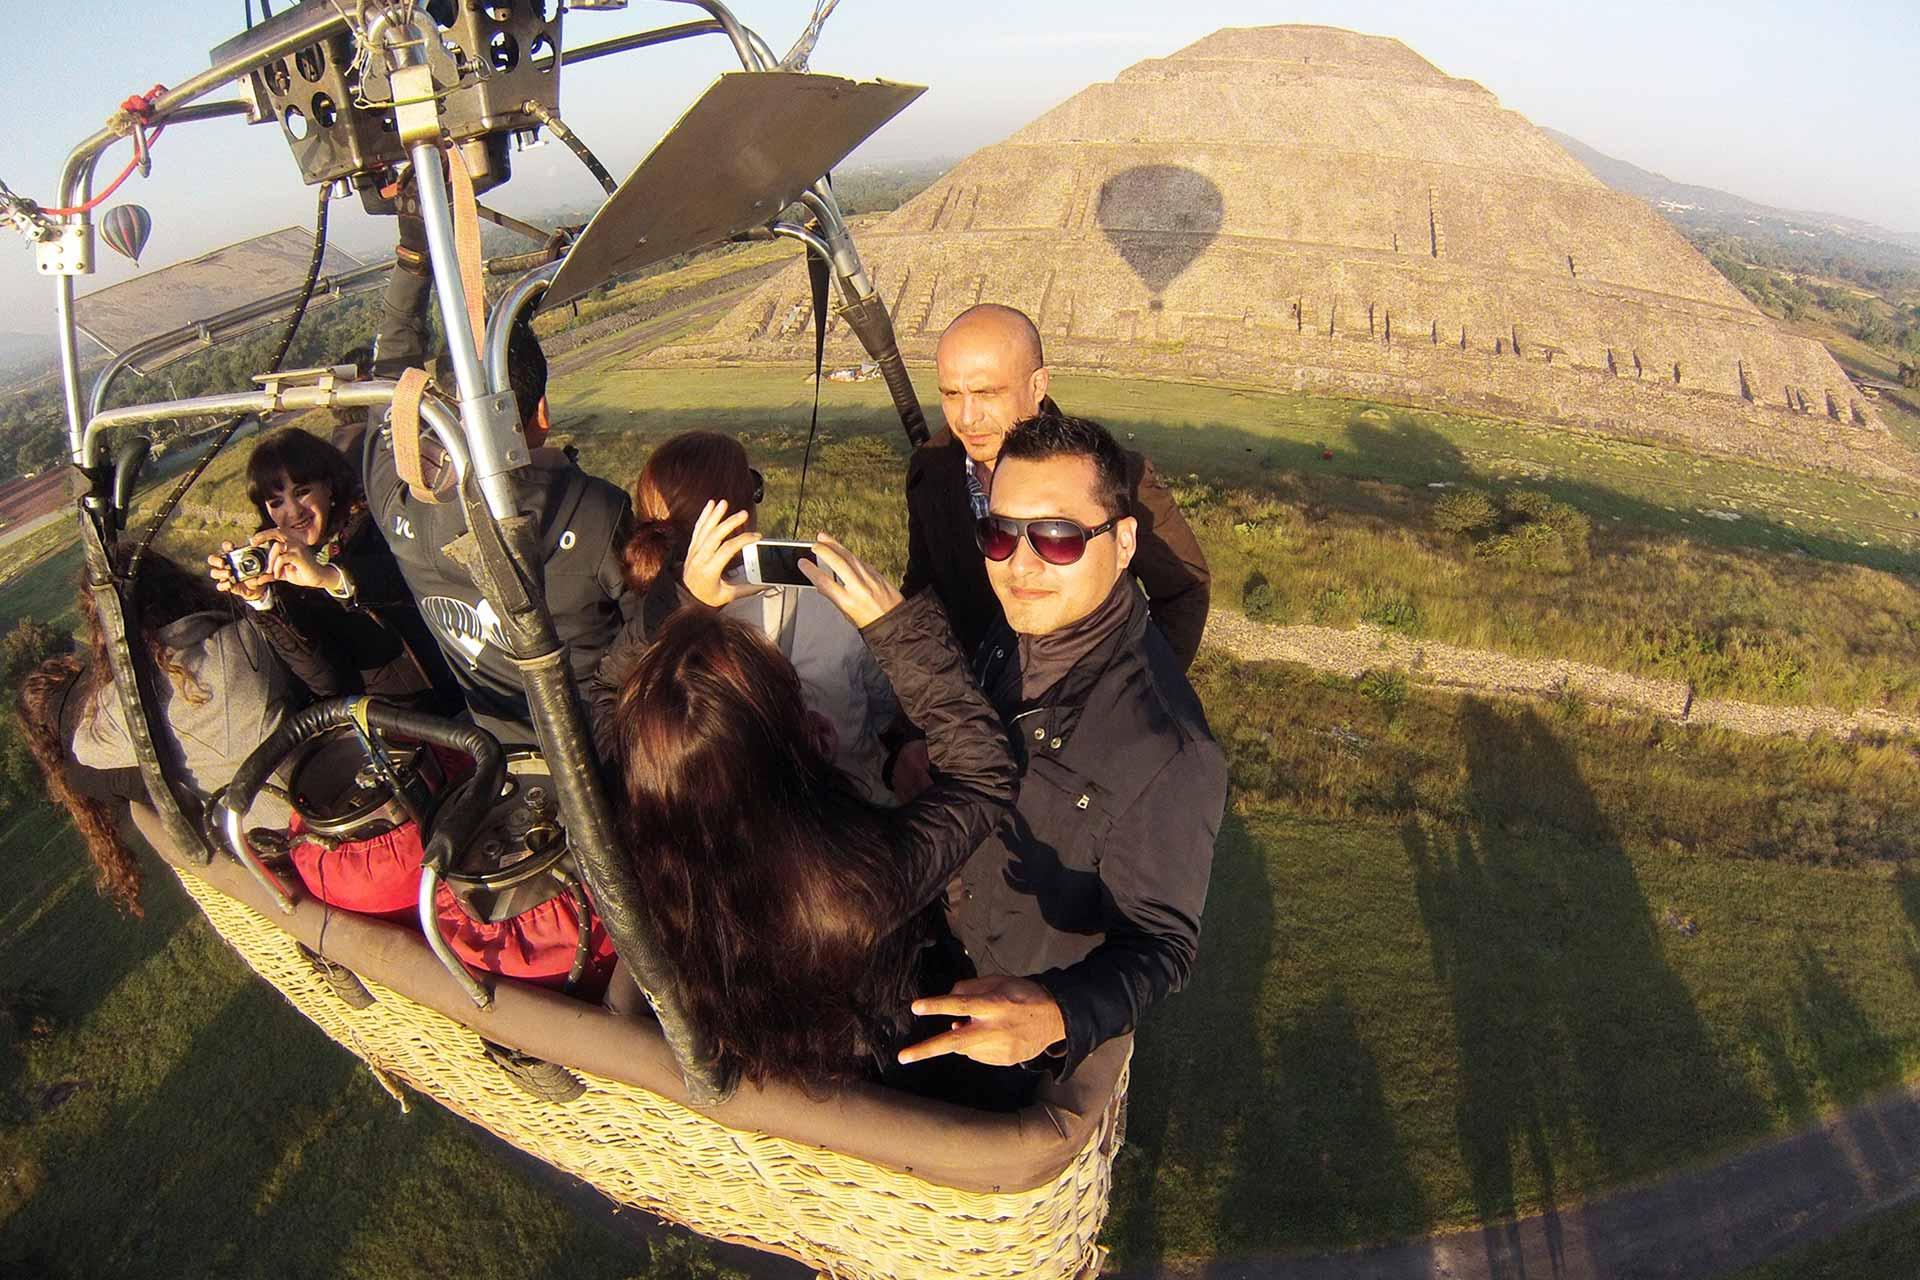 Viaje en Globo Teotihuacan | globosaerostaticos